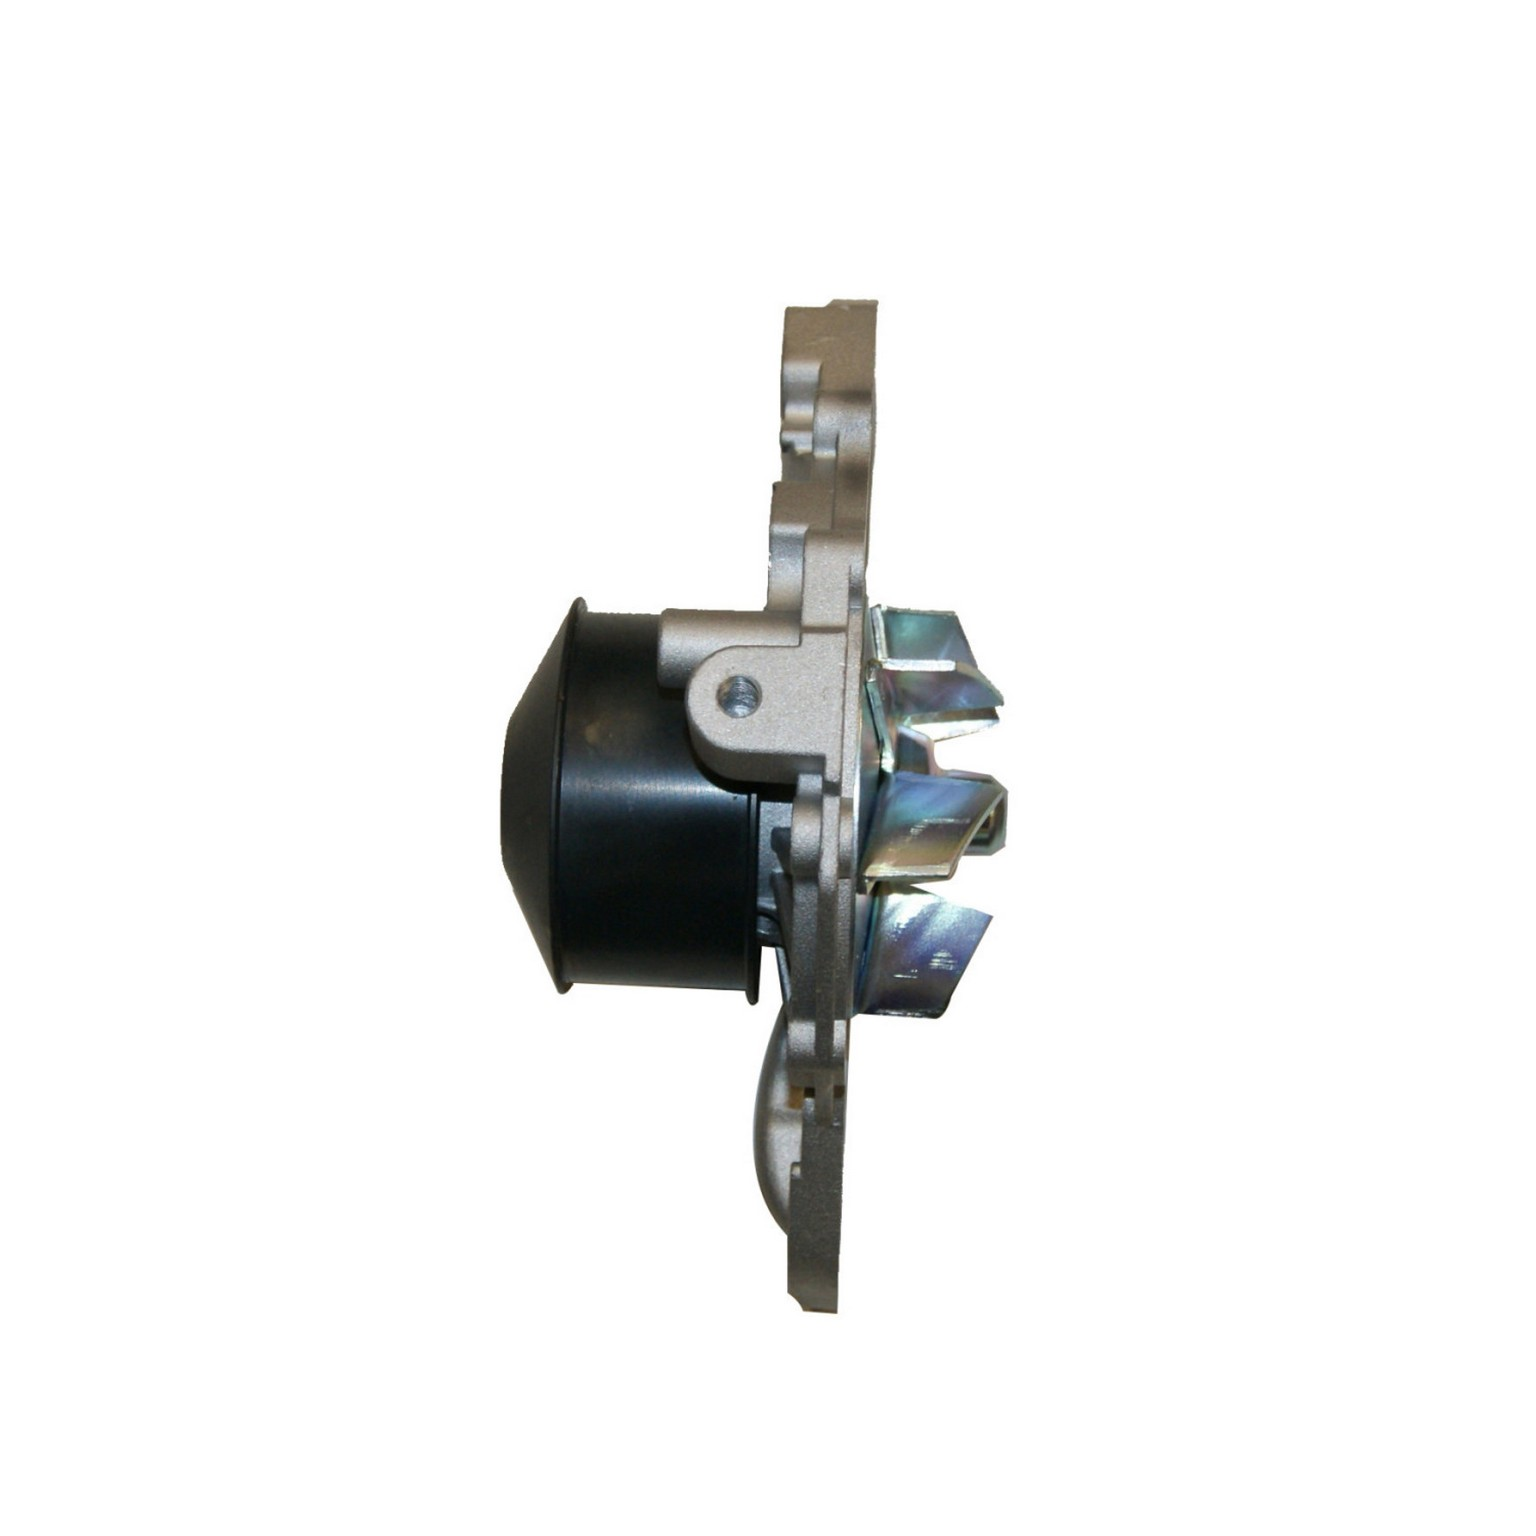 2005 Kia Amanti Engine Water Pump Manual Troubleshooting G6 146 1134